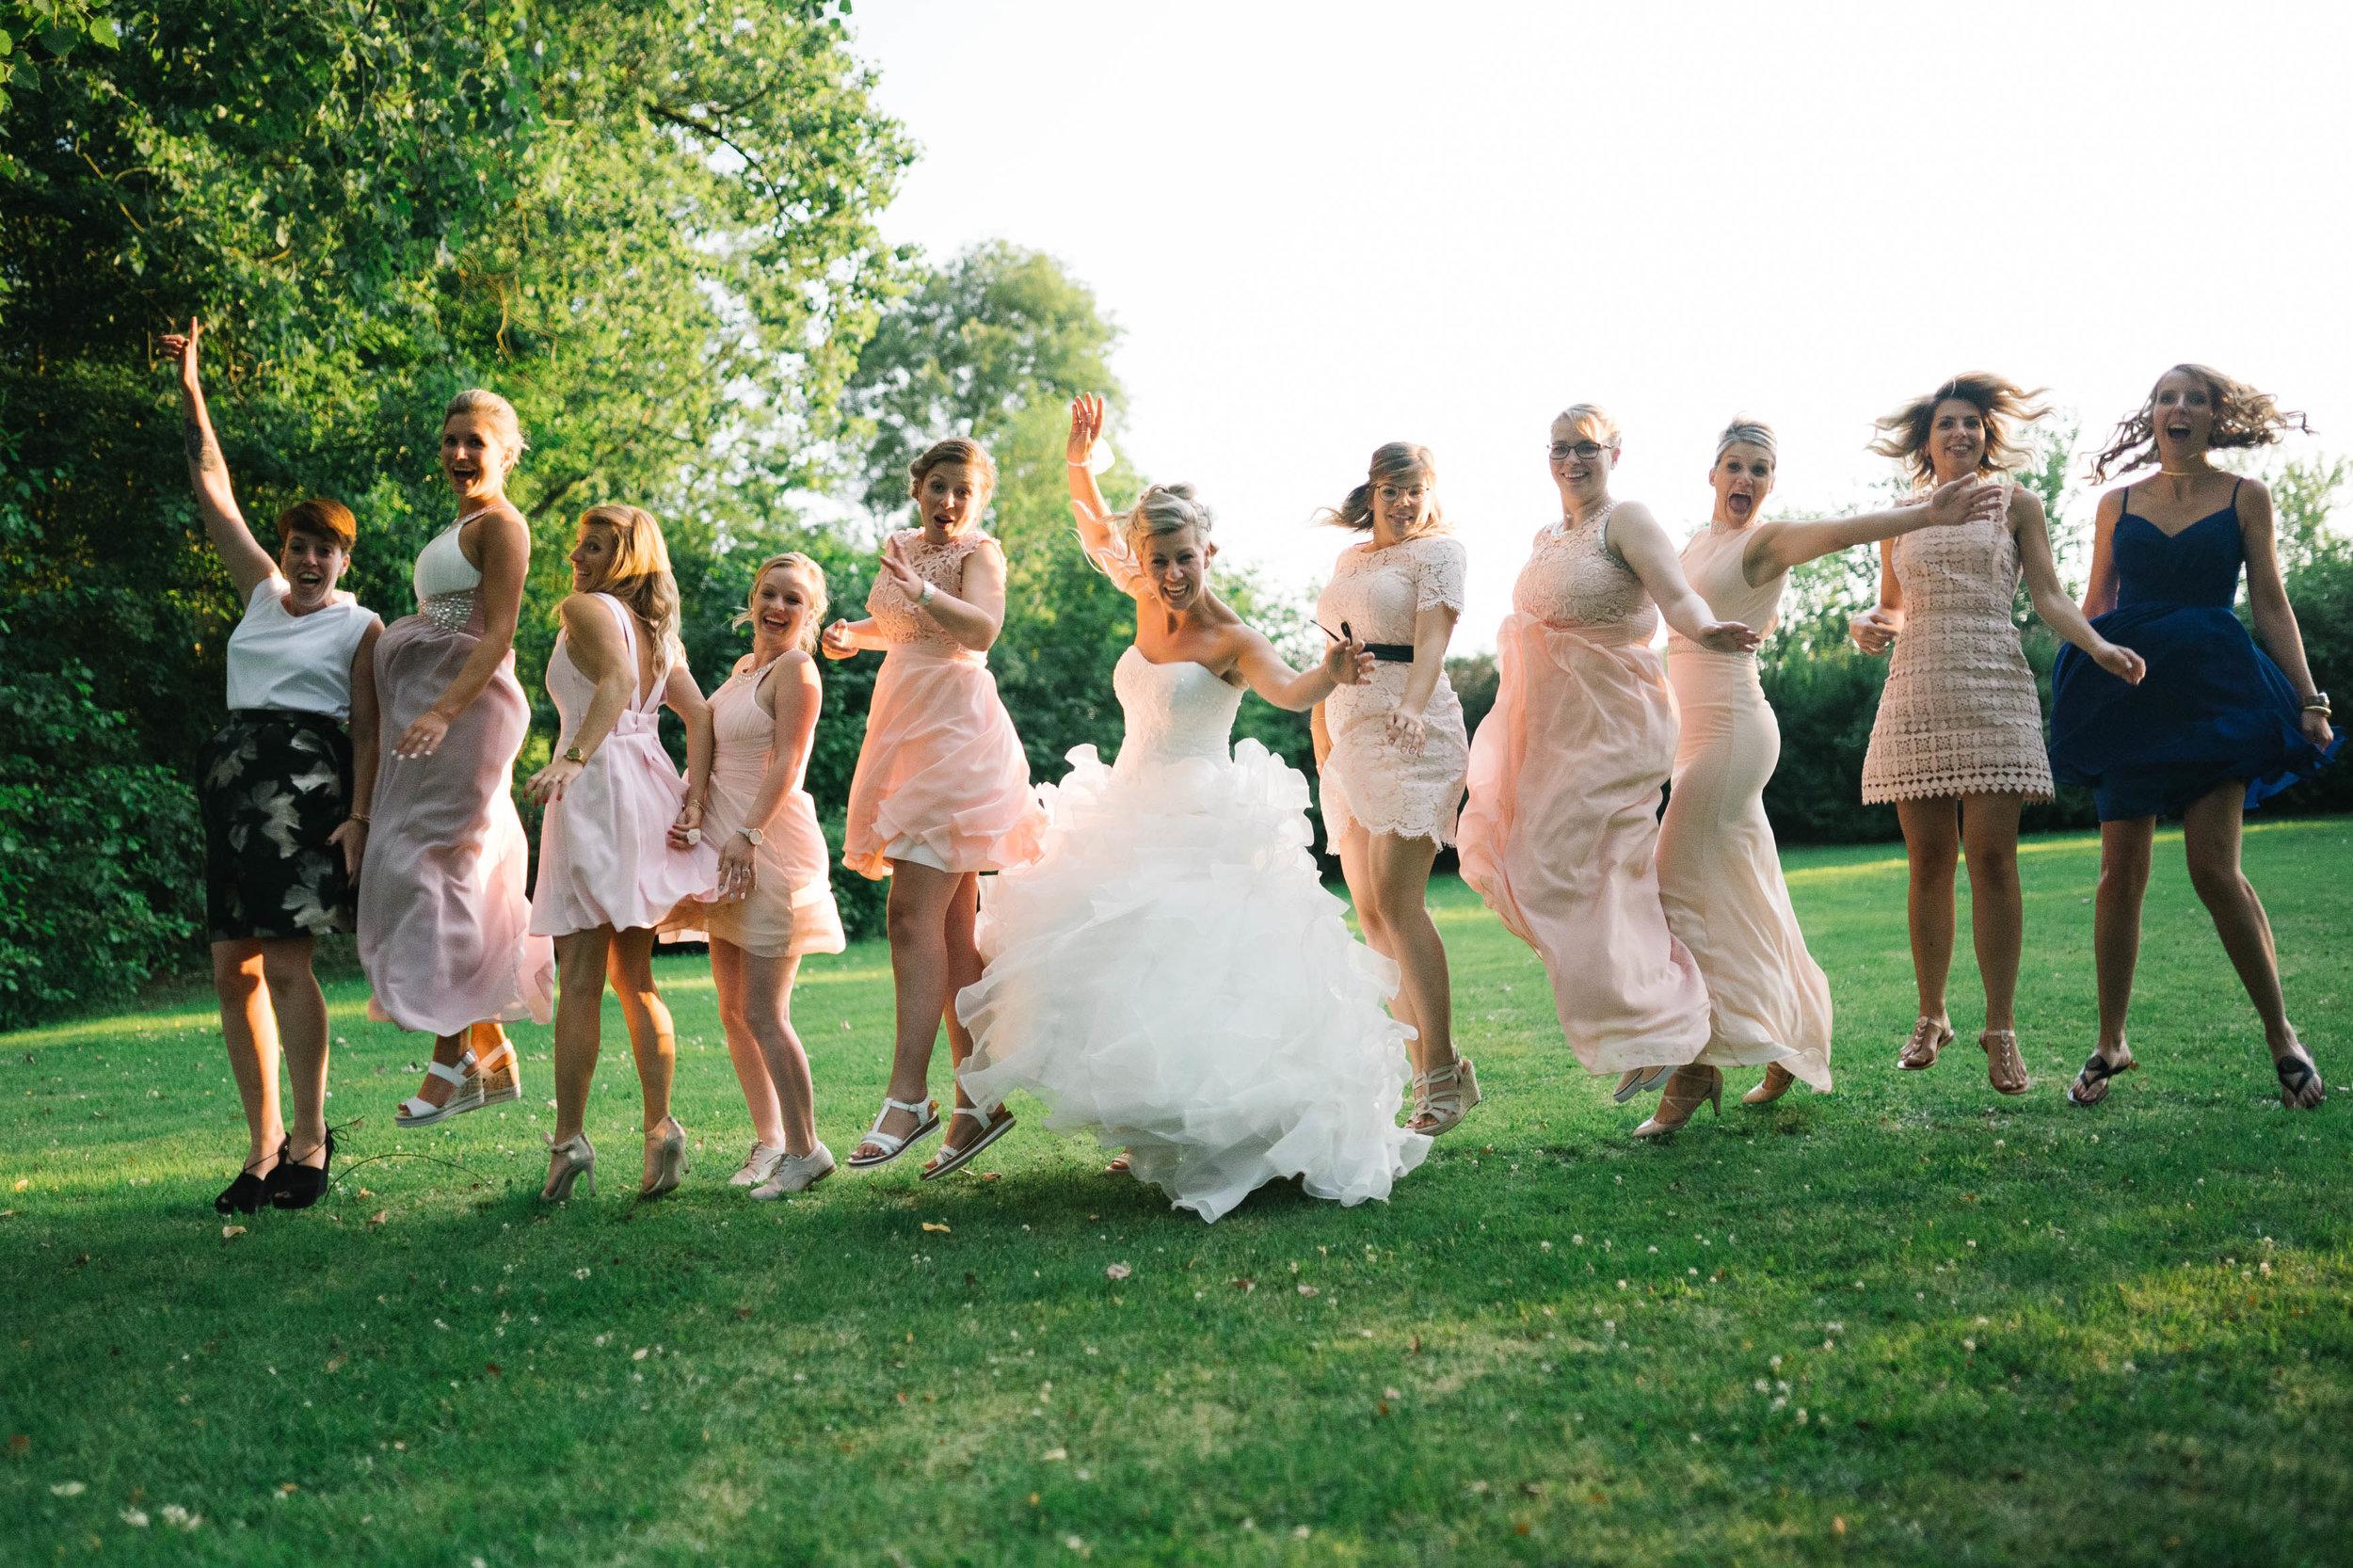 c-photographe-videaste-mariage-bruxelles-leleu-61.jpg